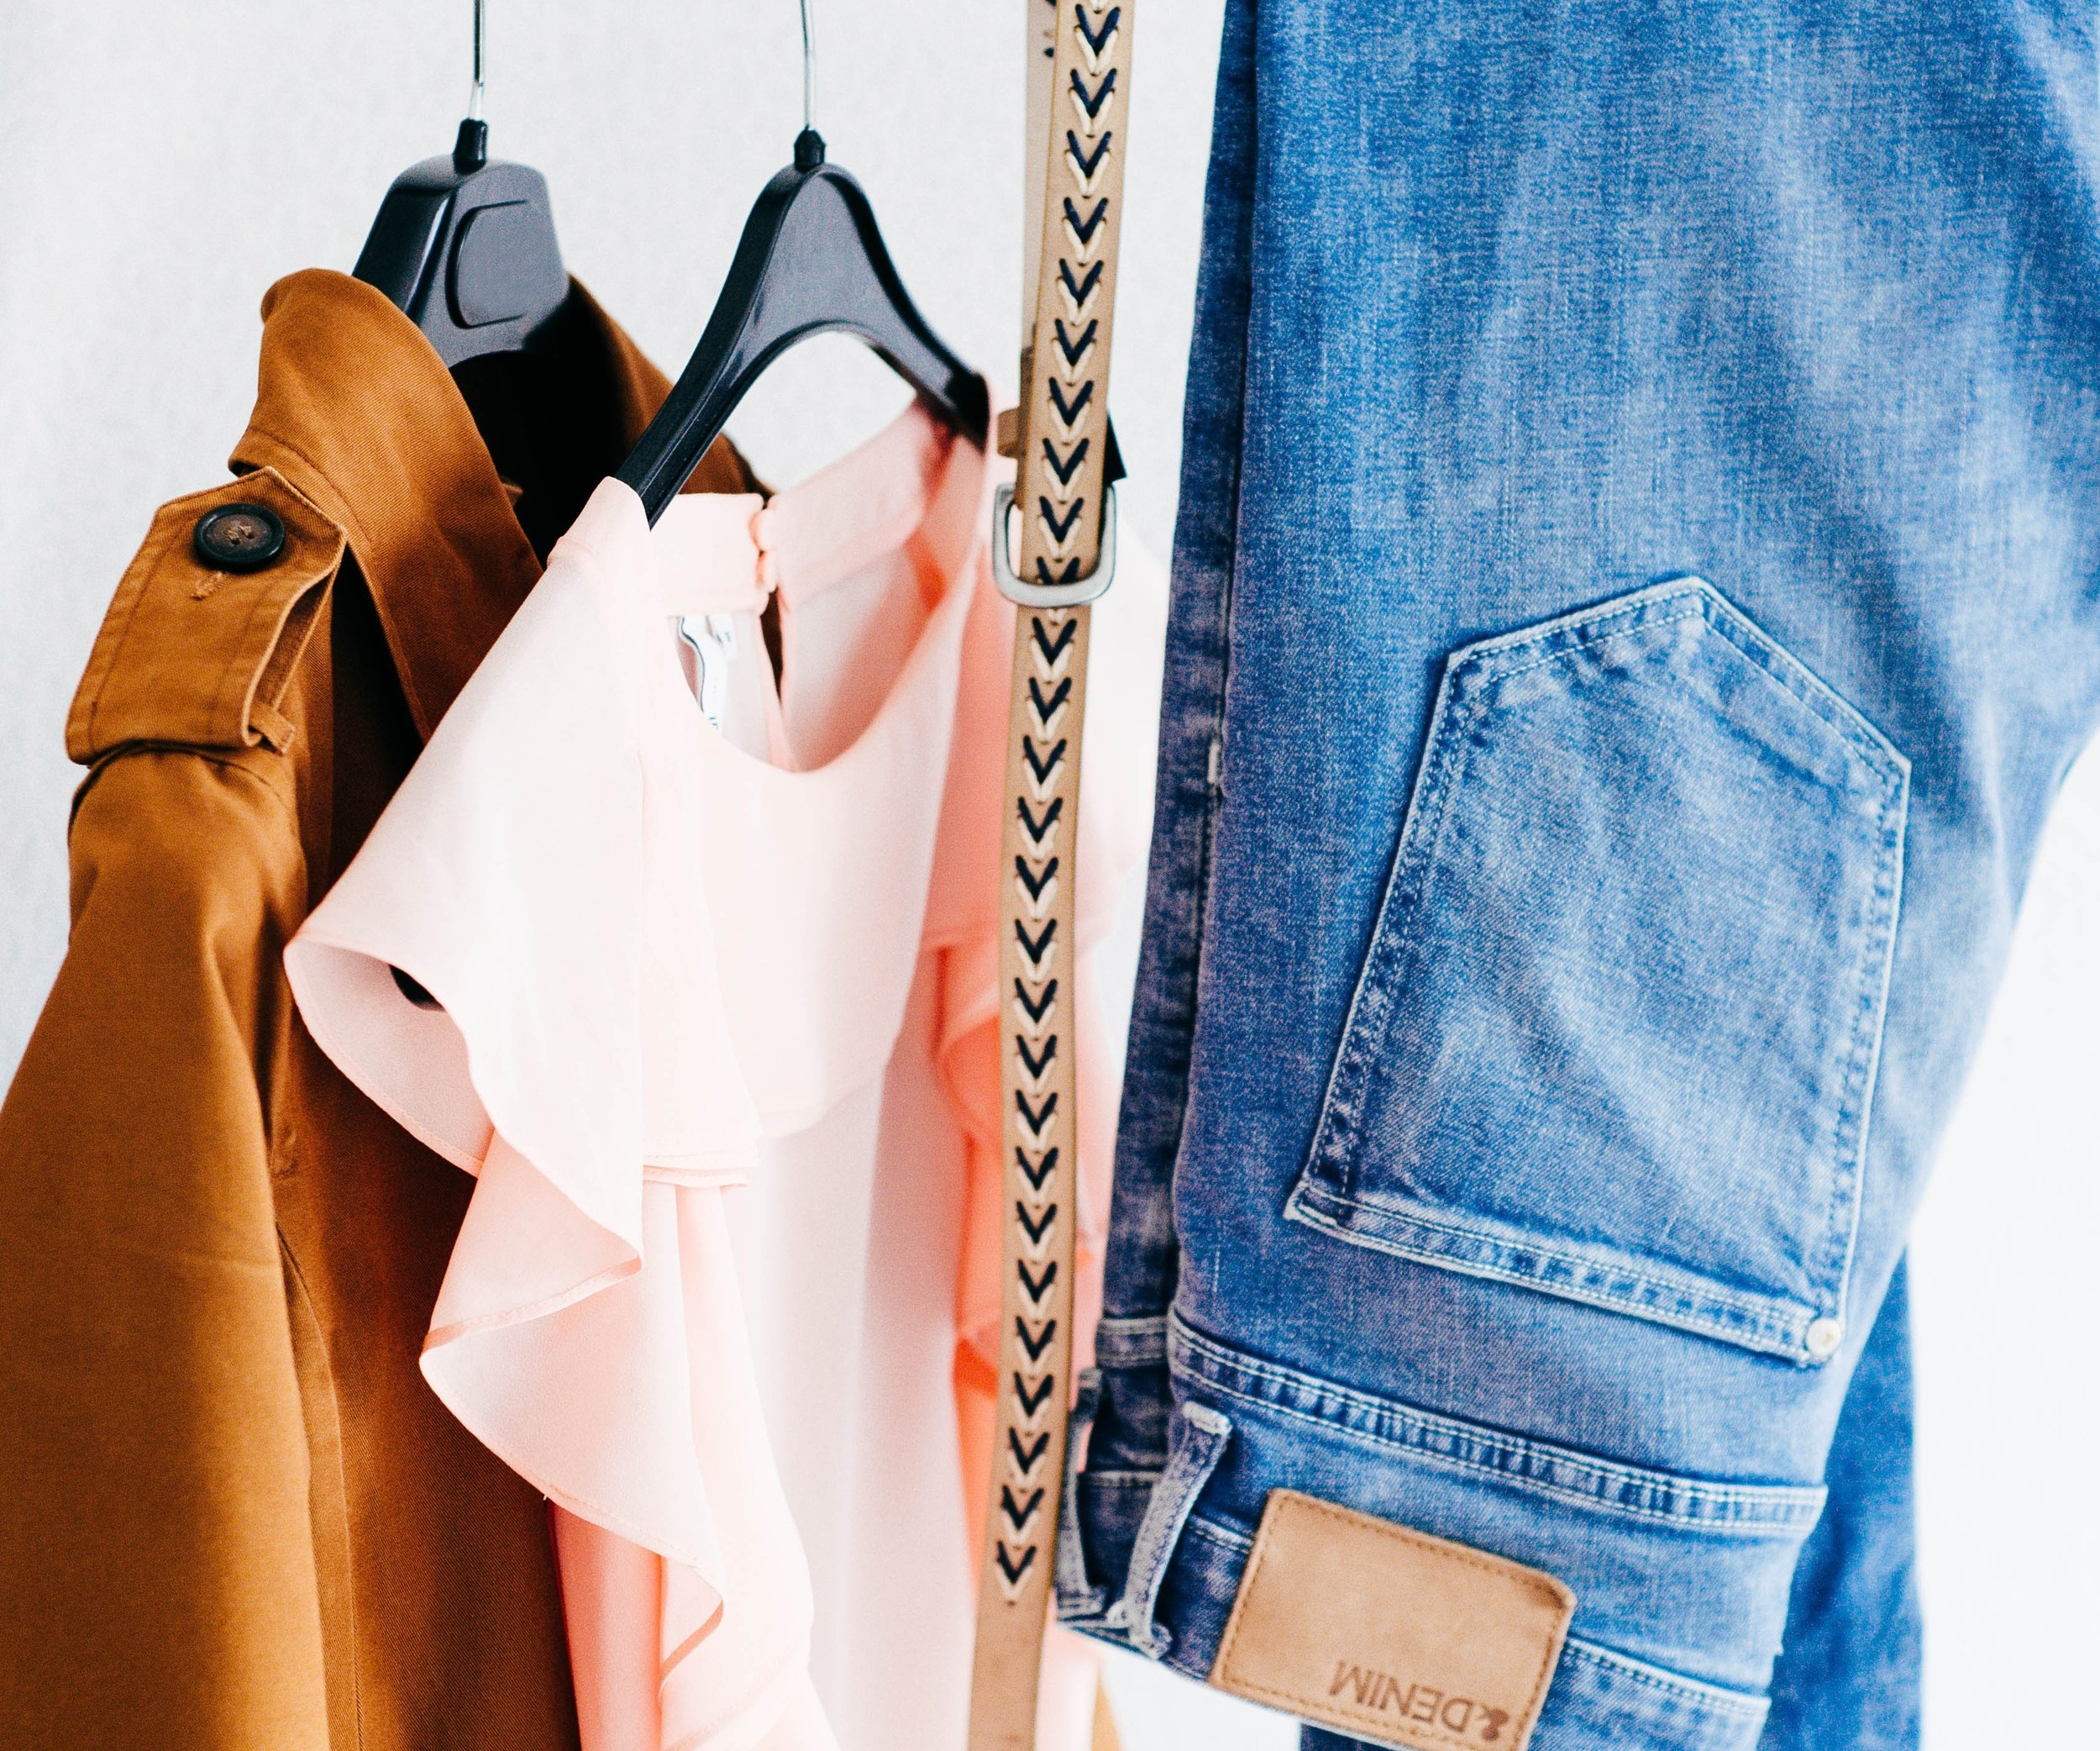 how-to-pack-clothing-brandon-moving-and-storage-arkansas-alexandra-gorn-260989.jpg